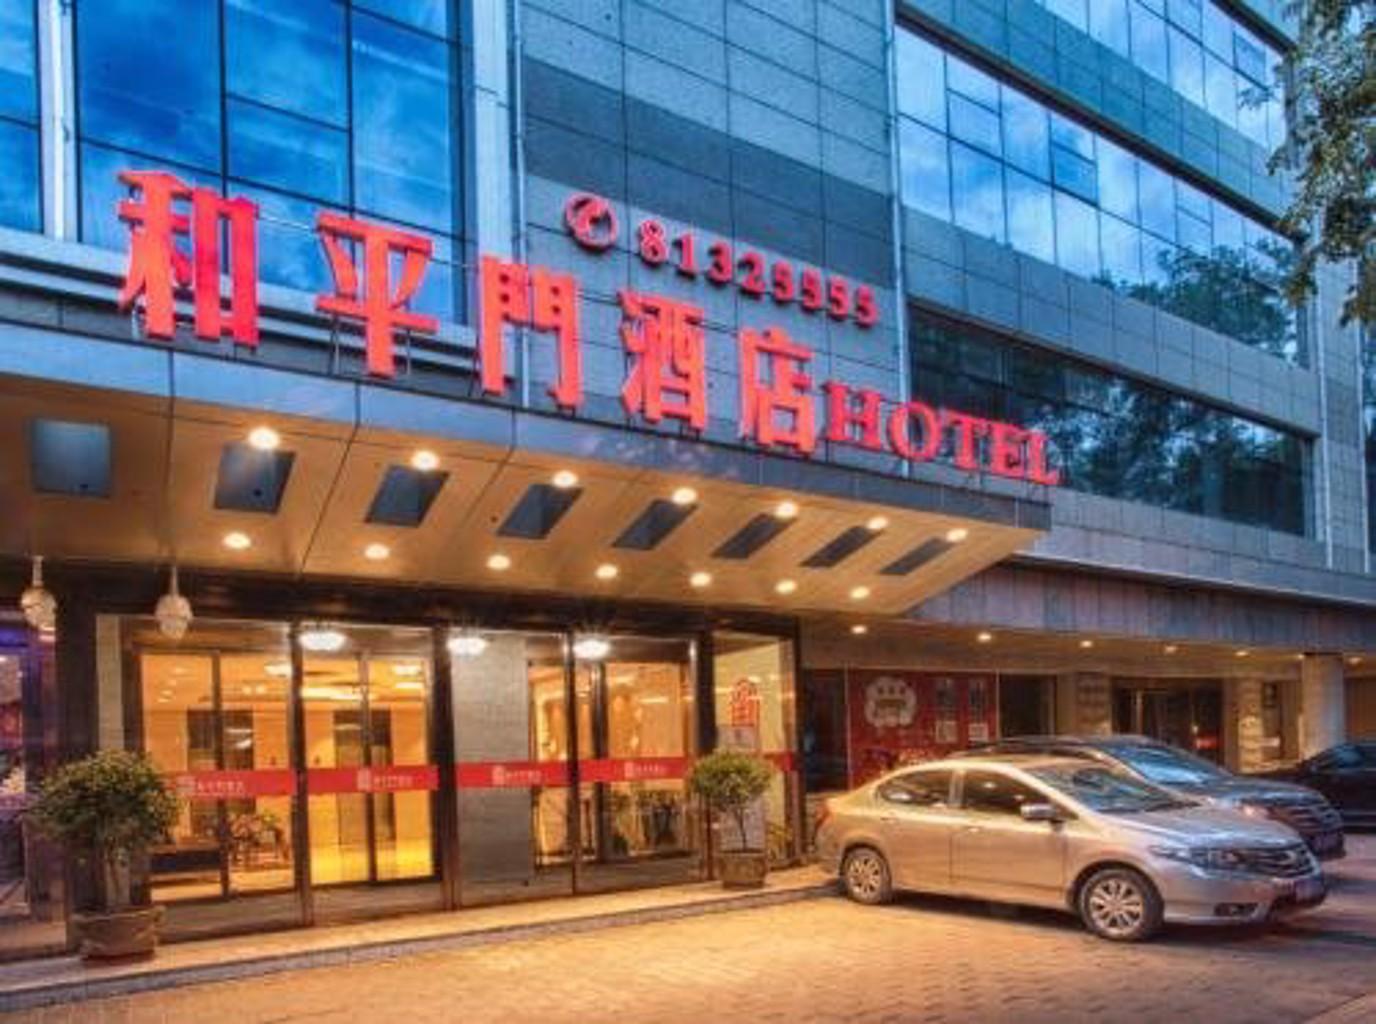 Xi'an Peace Arch Hotel